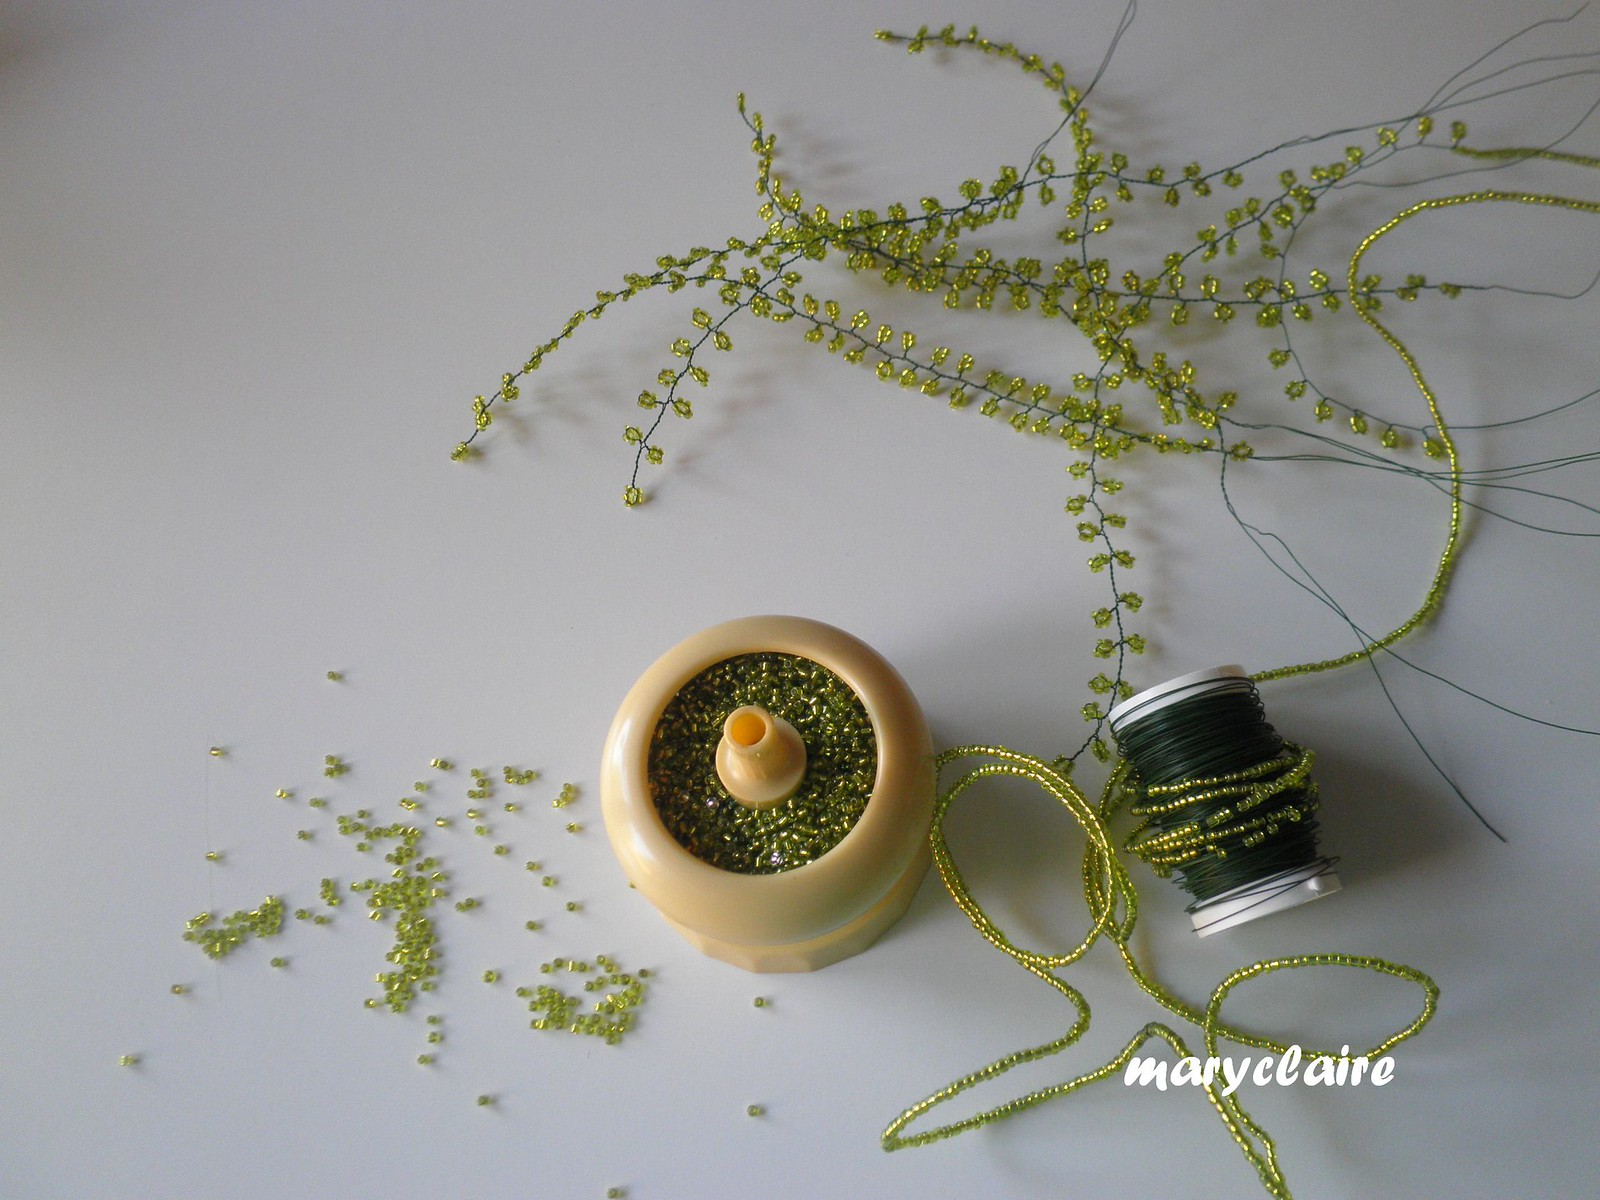 perline verdi e infilata